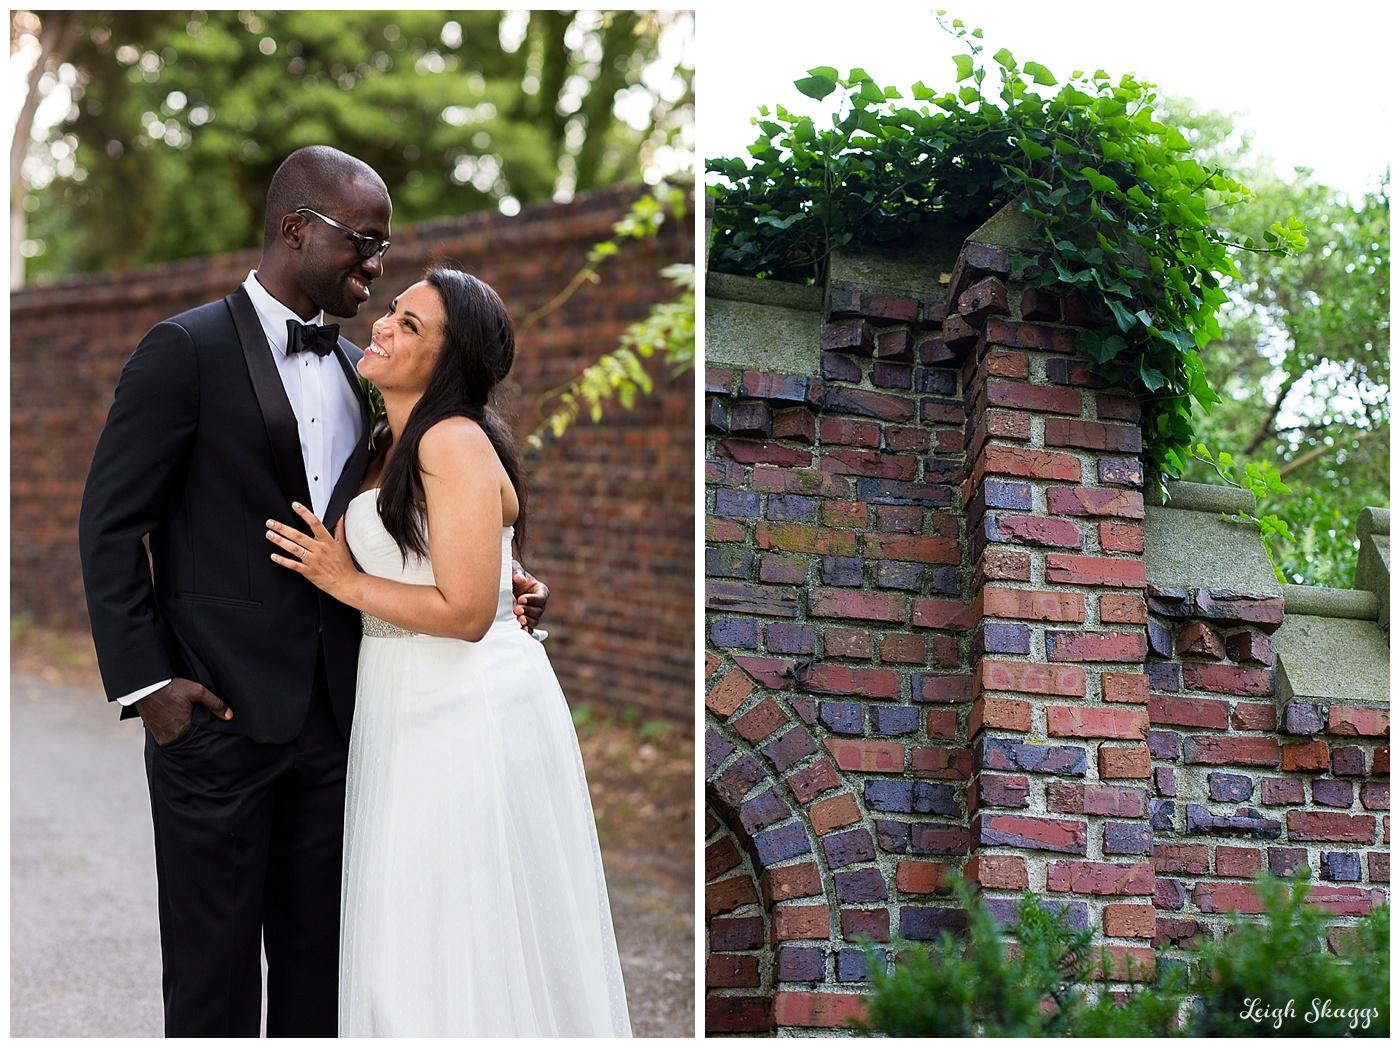 Alena & Luke are Married!  A Norfolk Virginia Hermitage Museum and Garden Wedding